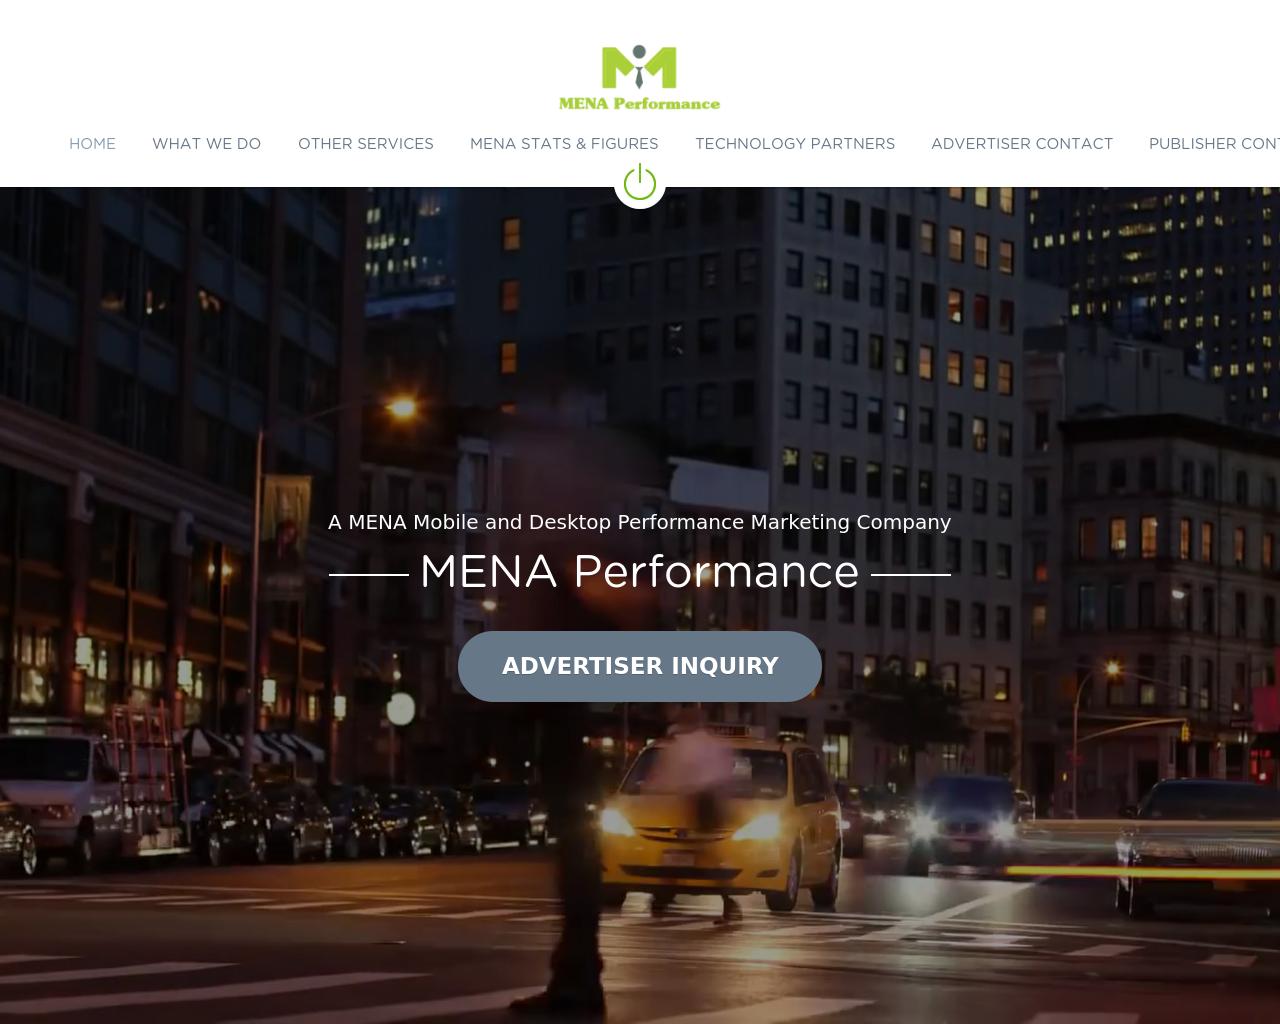 MENAPeformance-Advertising-Reviews-Pricing